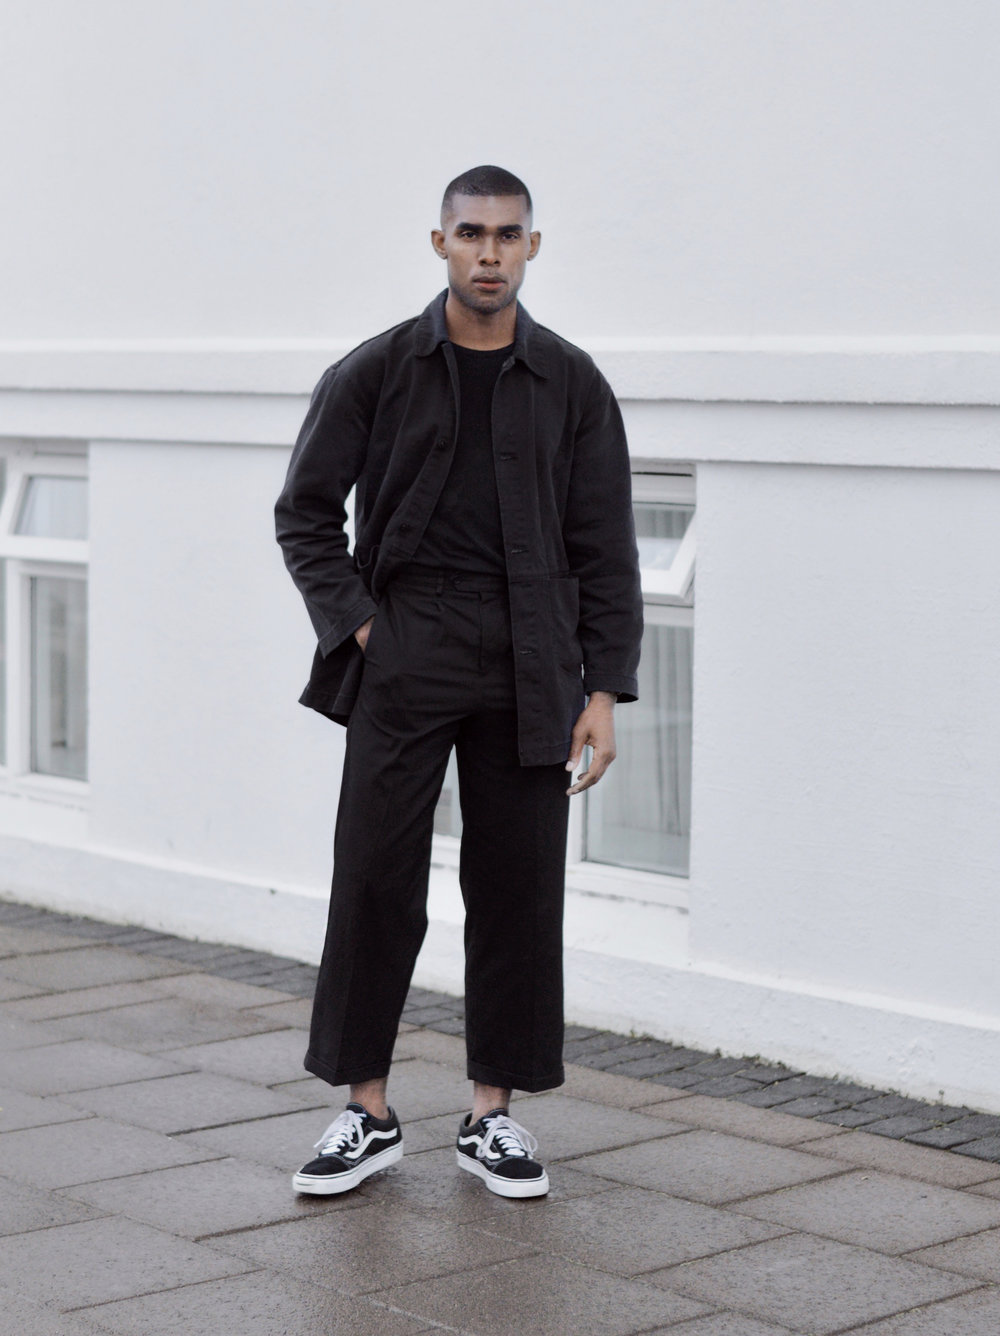 The-Look-Principle-Oversized-Worker-Style-In-Reykjavik-7.jpg